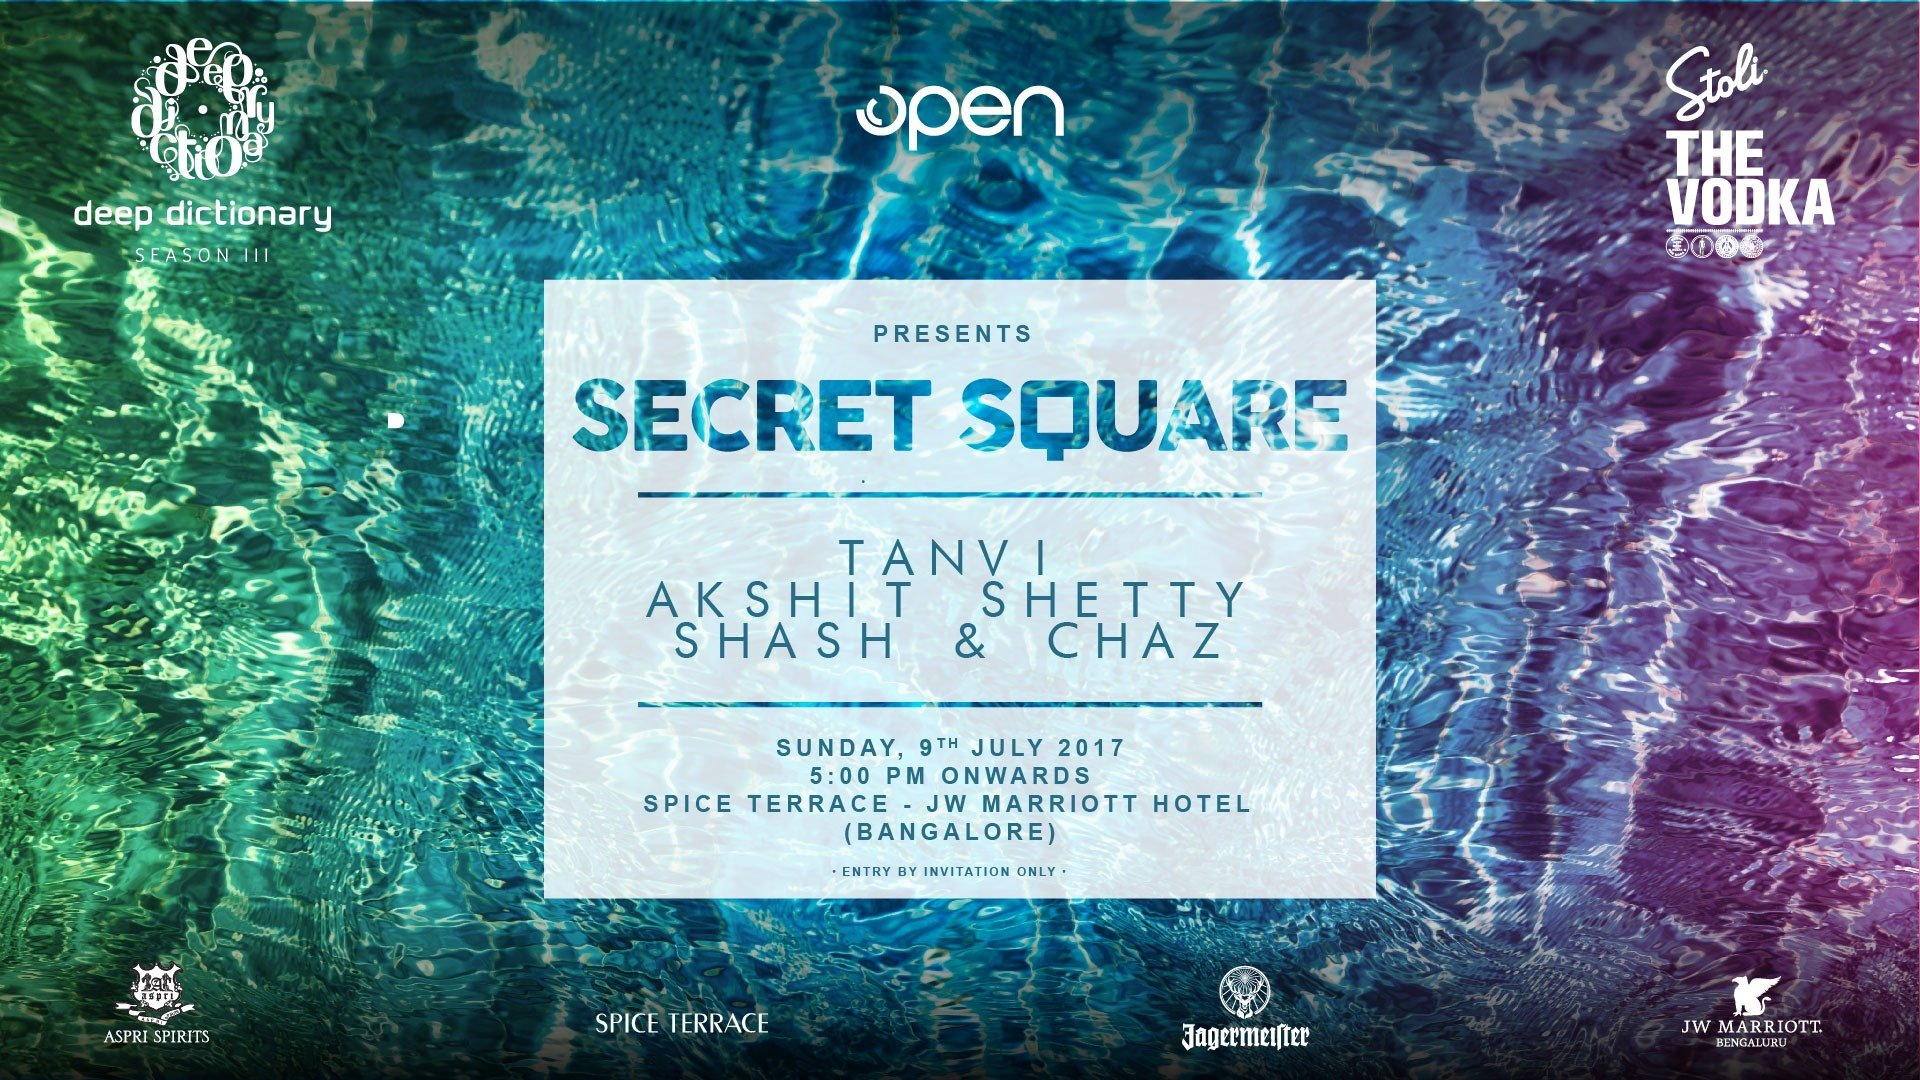 Deep Dictionary Presents Secret Square Spice Terrace Poolside